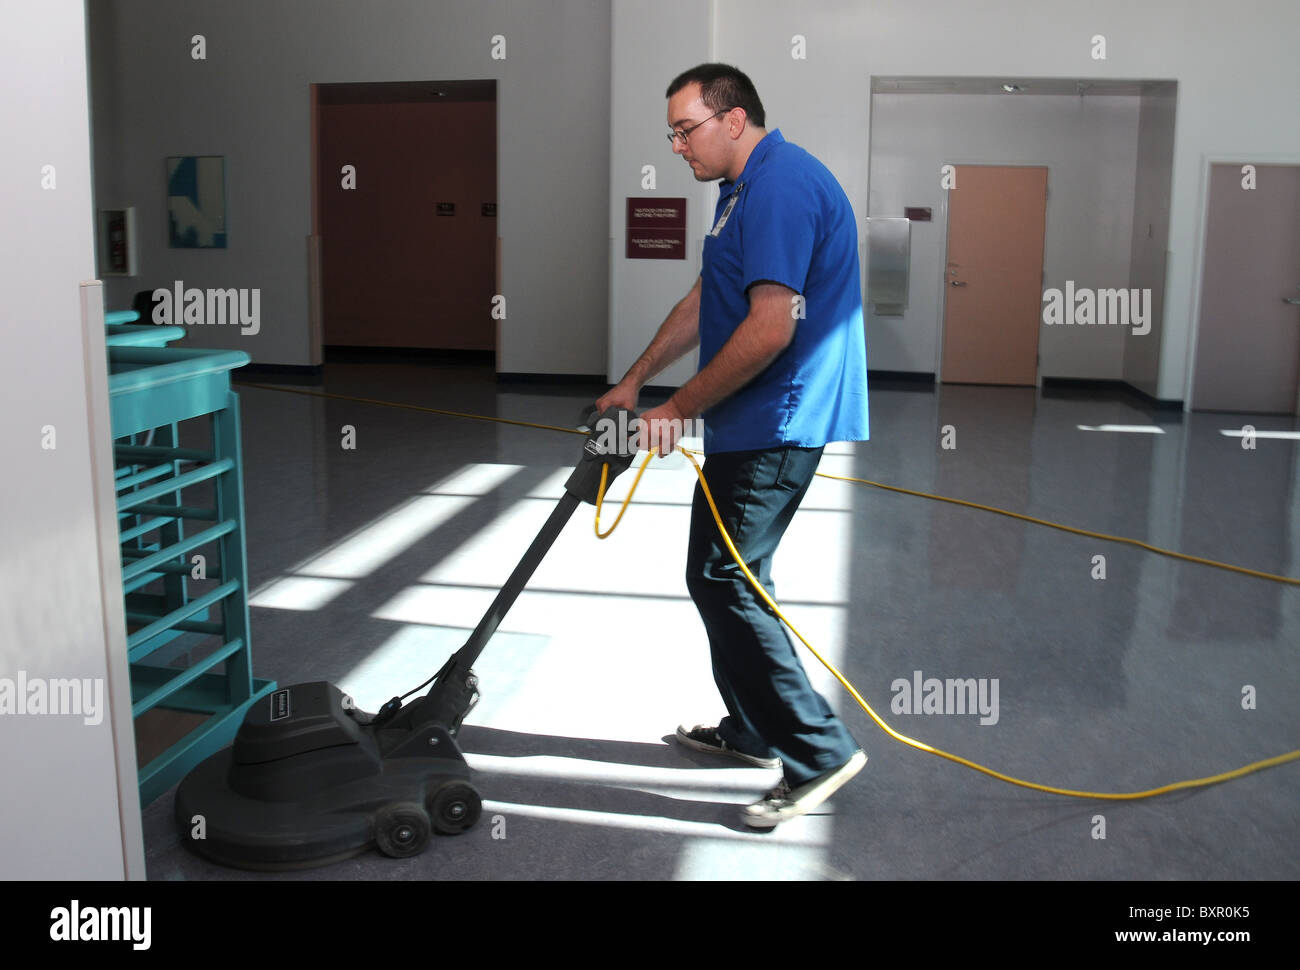 A custodian buffs a floor. - Stock Image